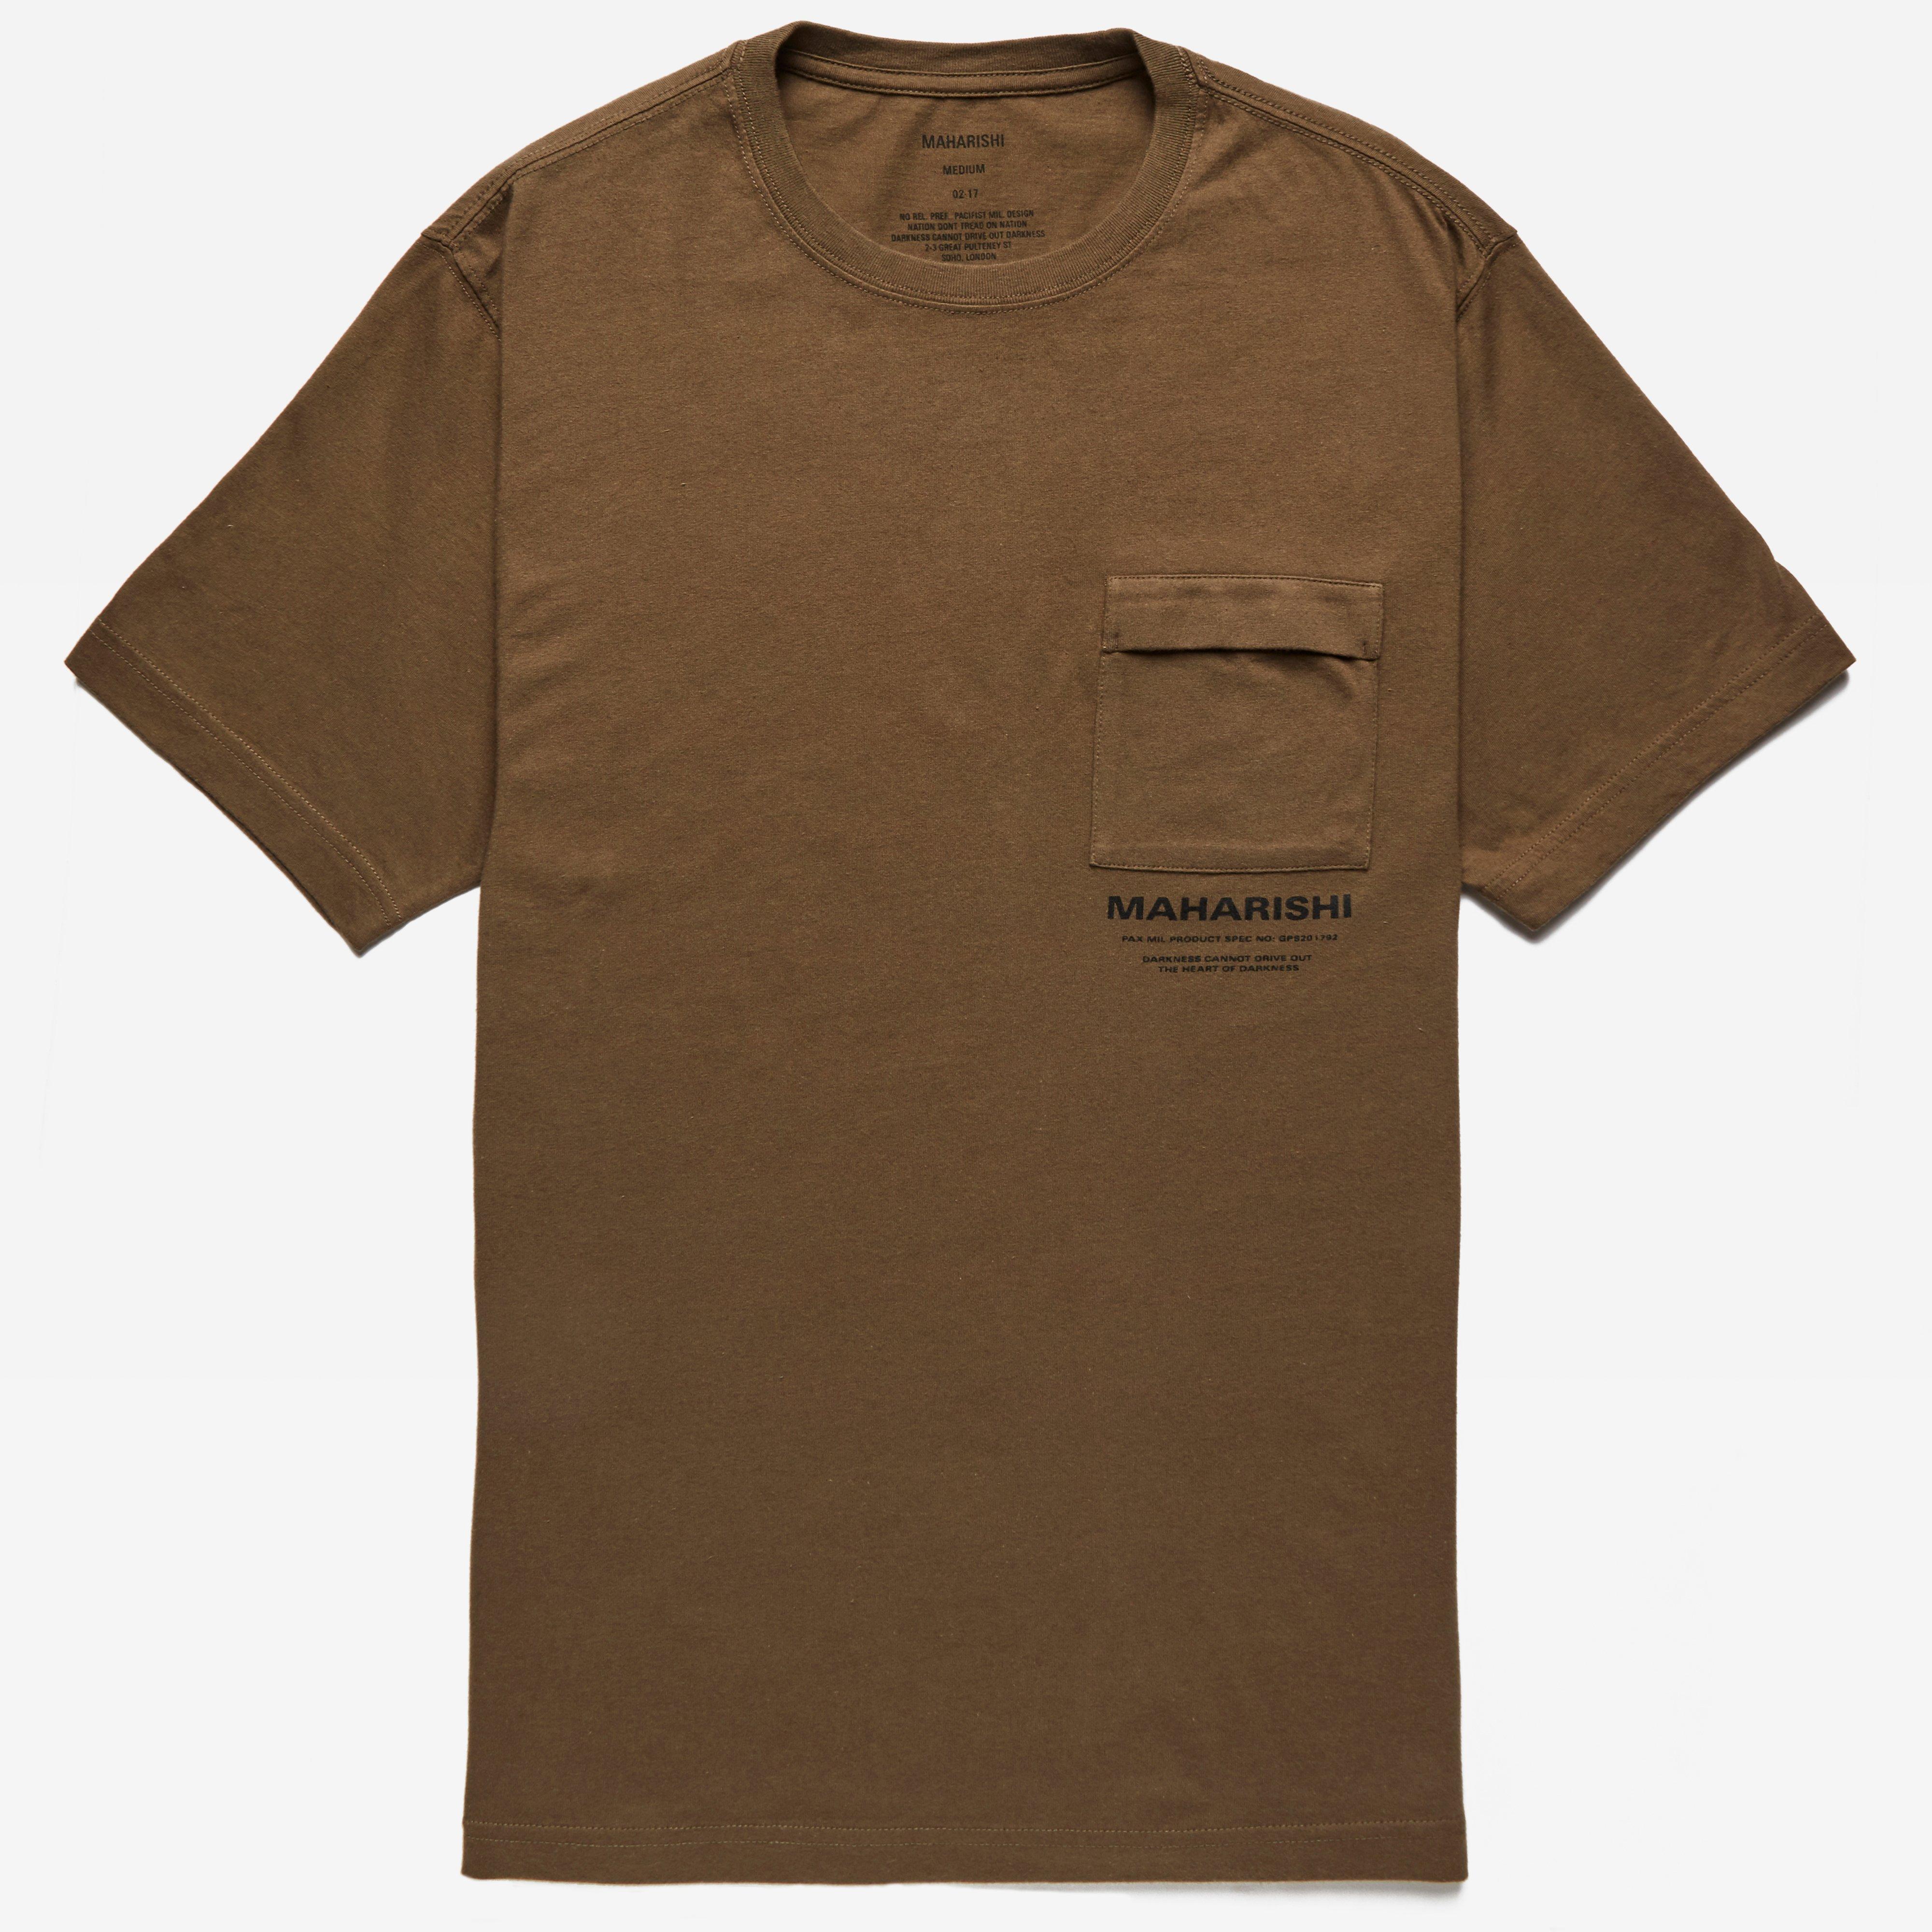 maharishi T-shirt Militaire Couvert